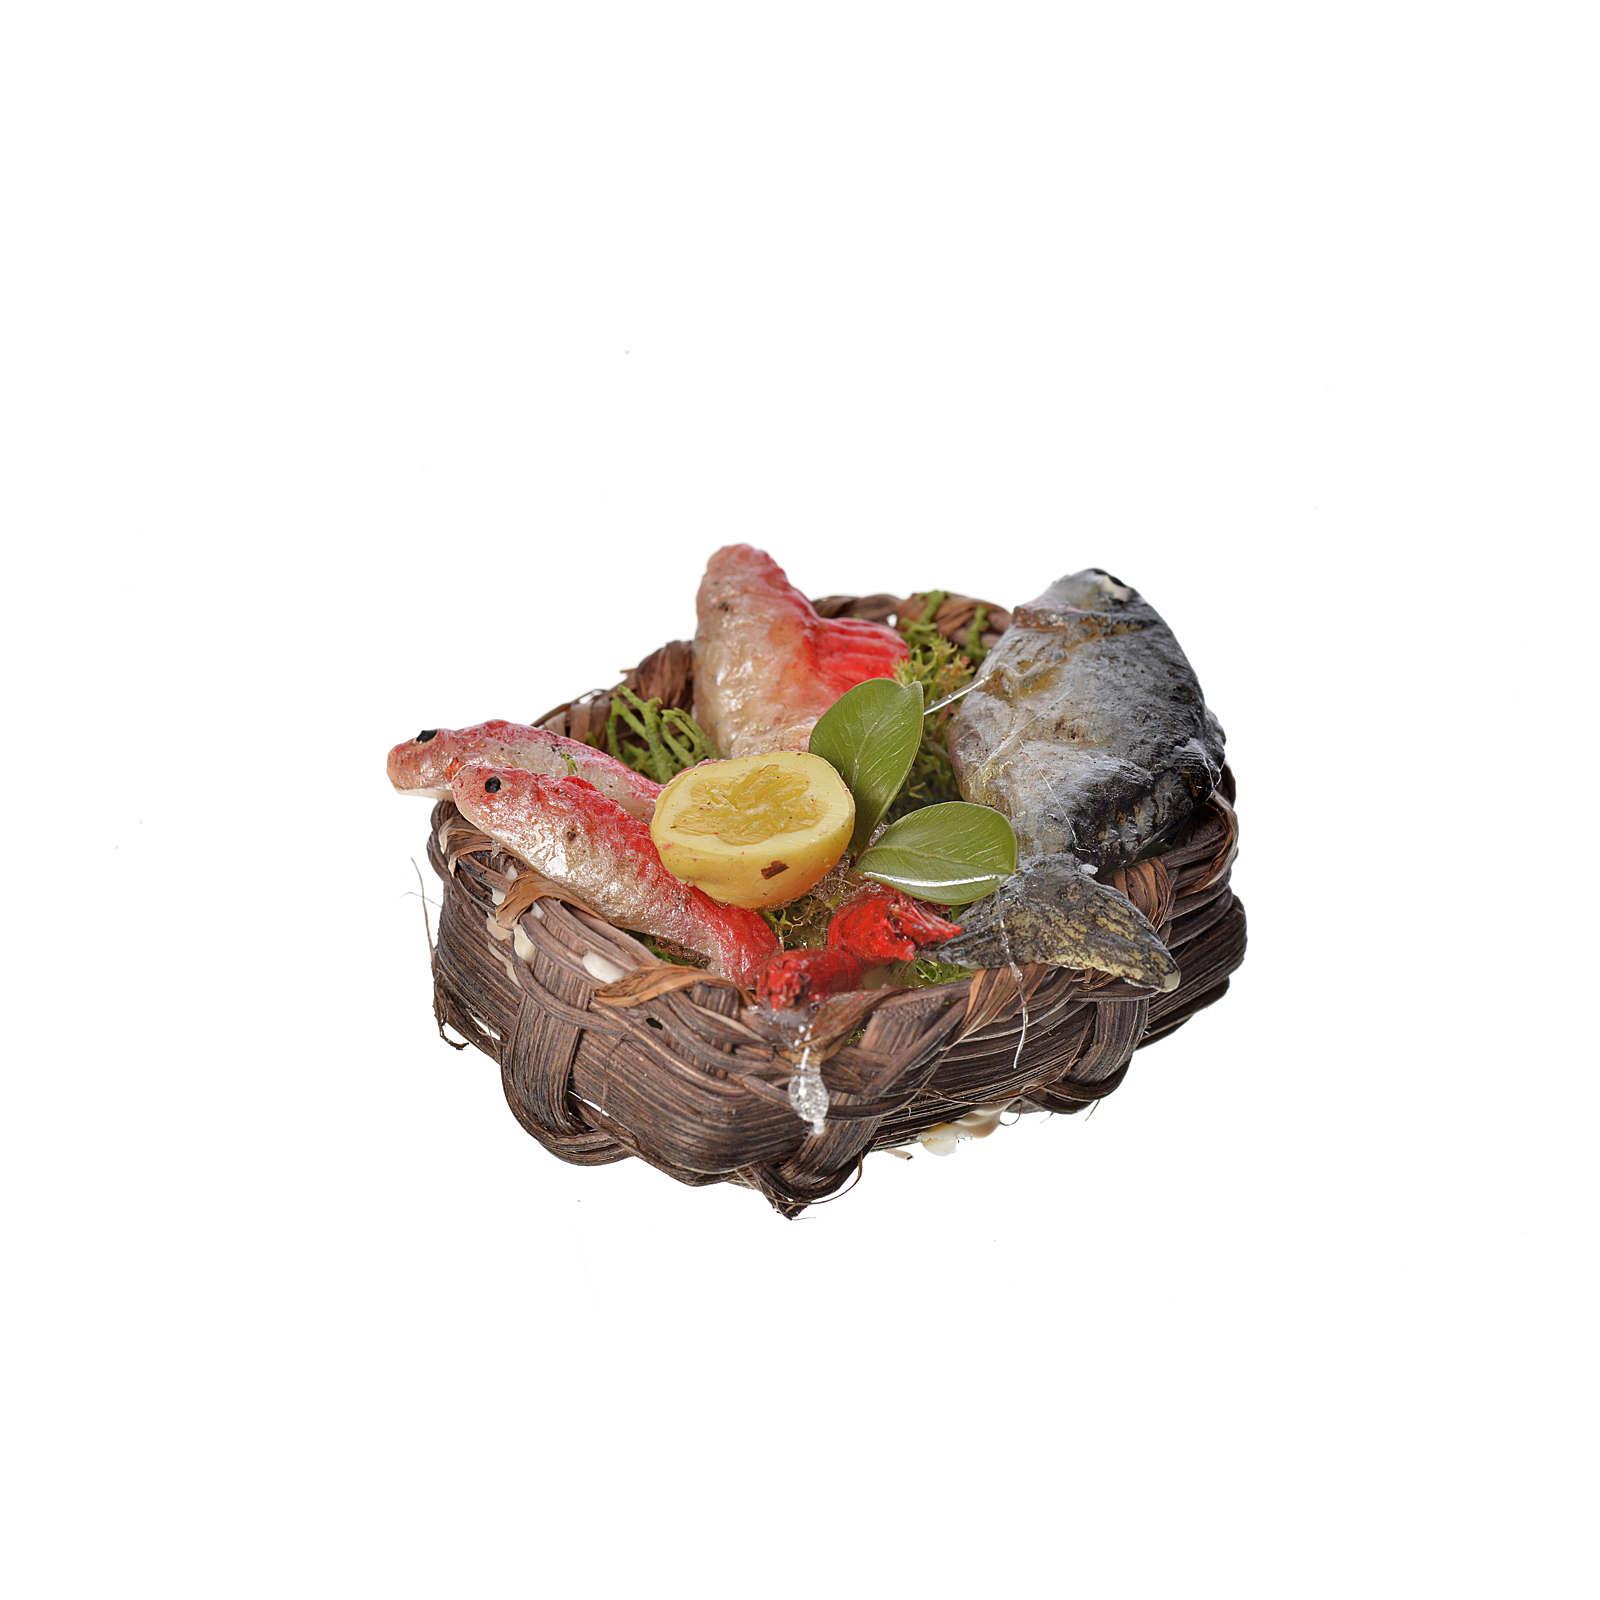 Panier poissons en cire pour crèche 4,5x5,5x6 4